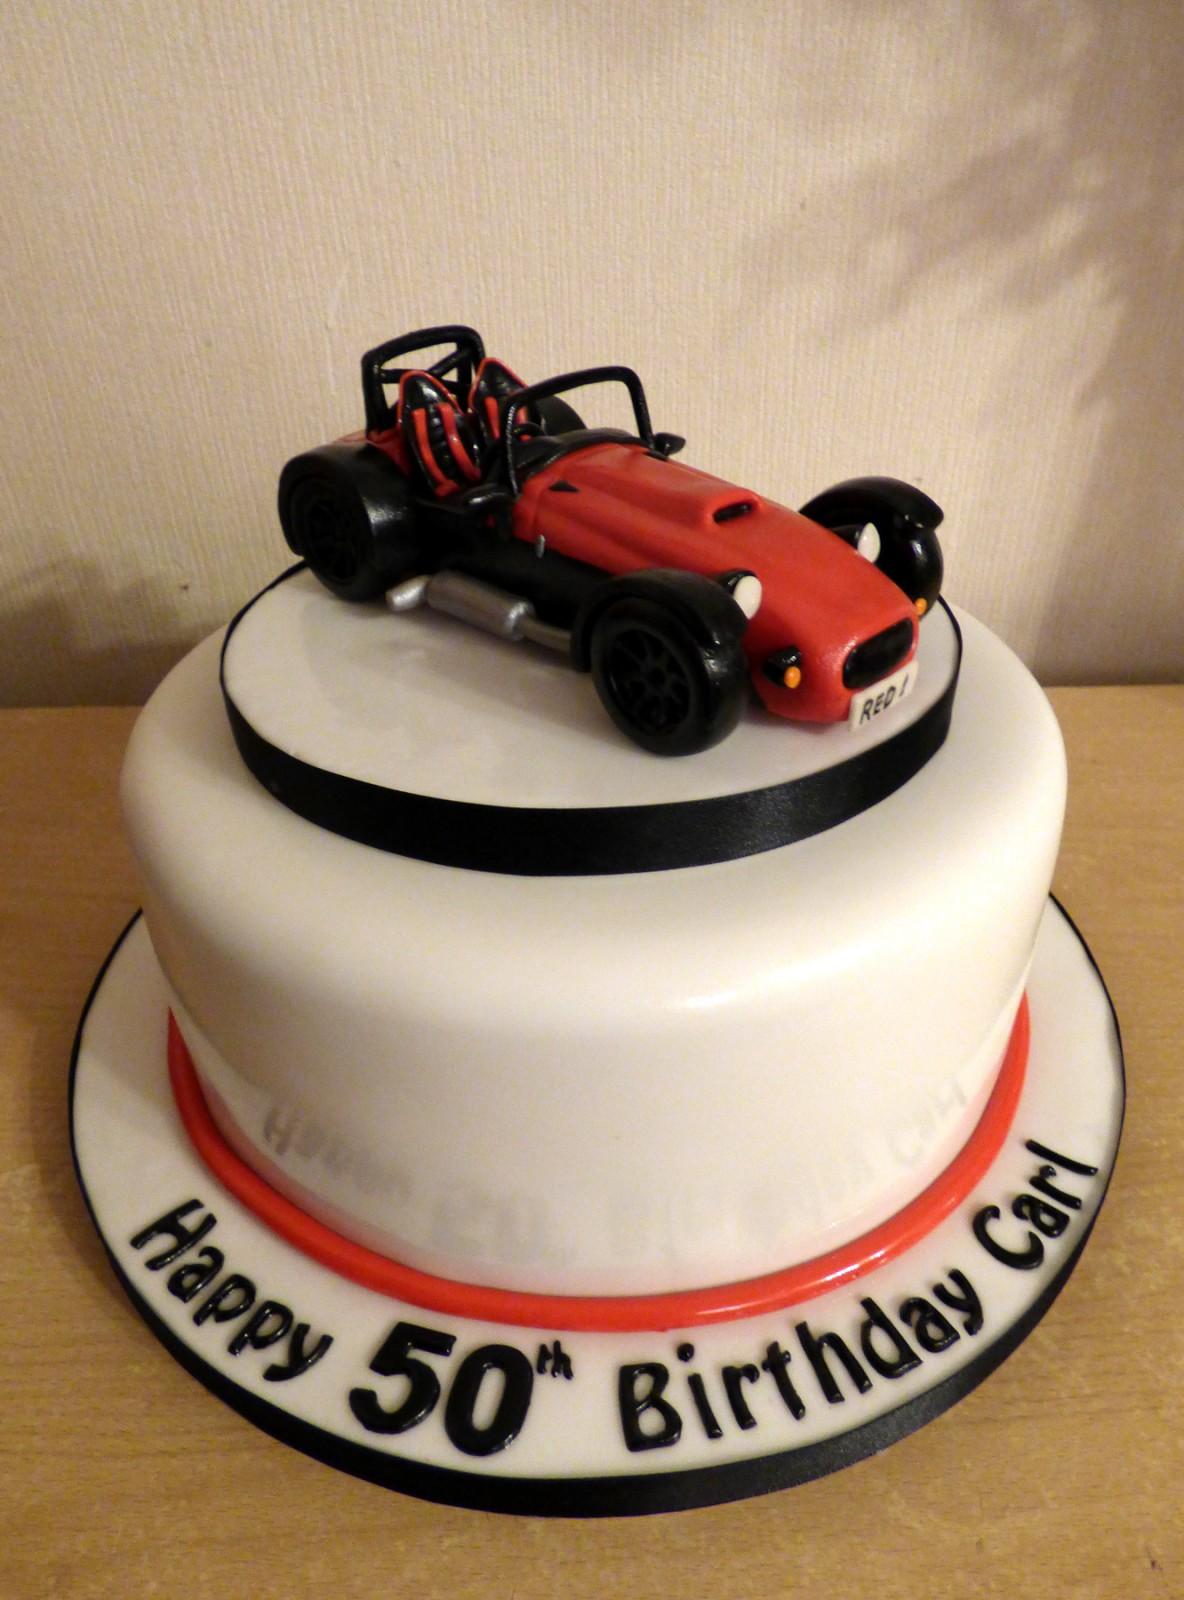 Brilliant Westfield Kit Car Birthday Cake Susies Cakes Birthday Cards Printable Opercafe Filternl